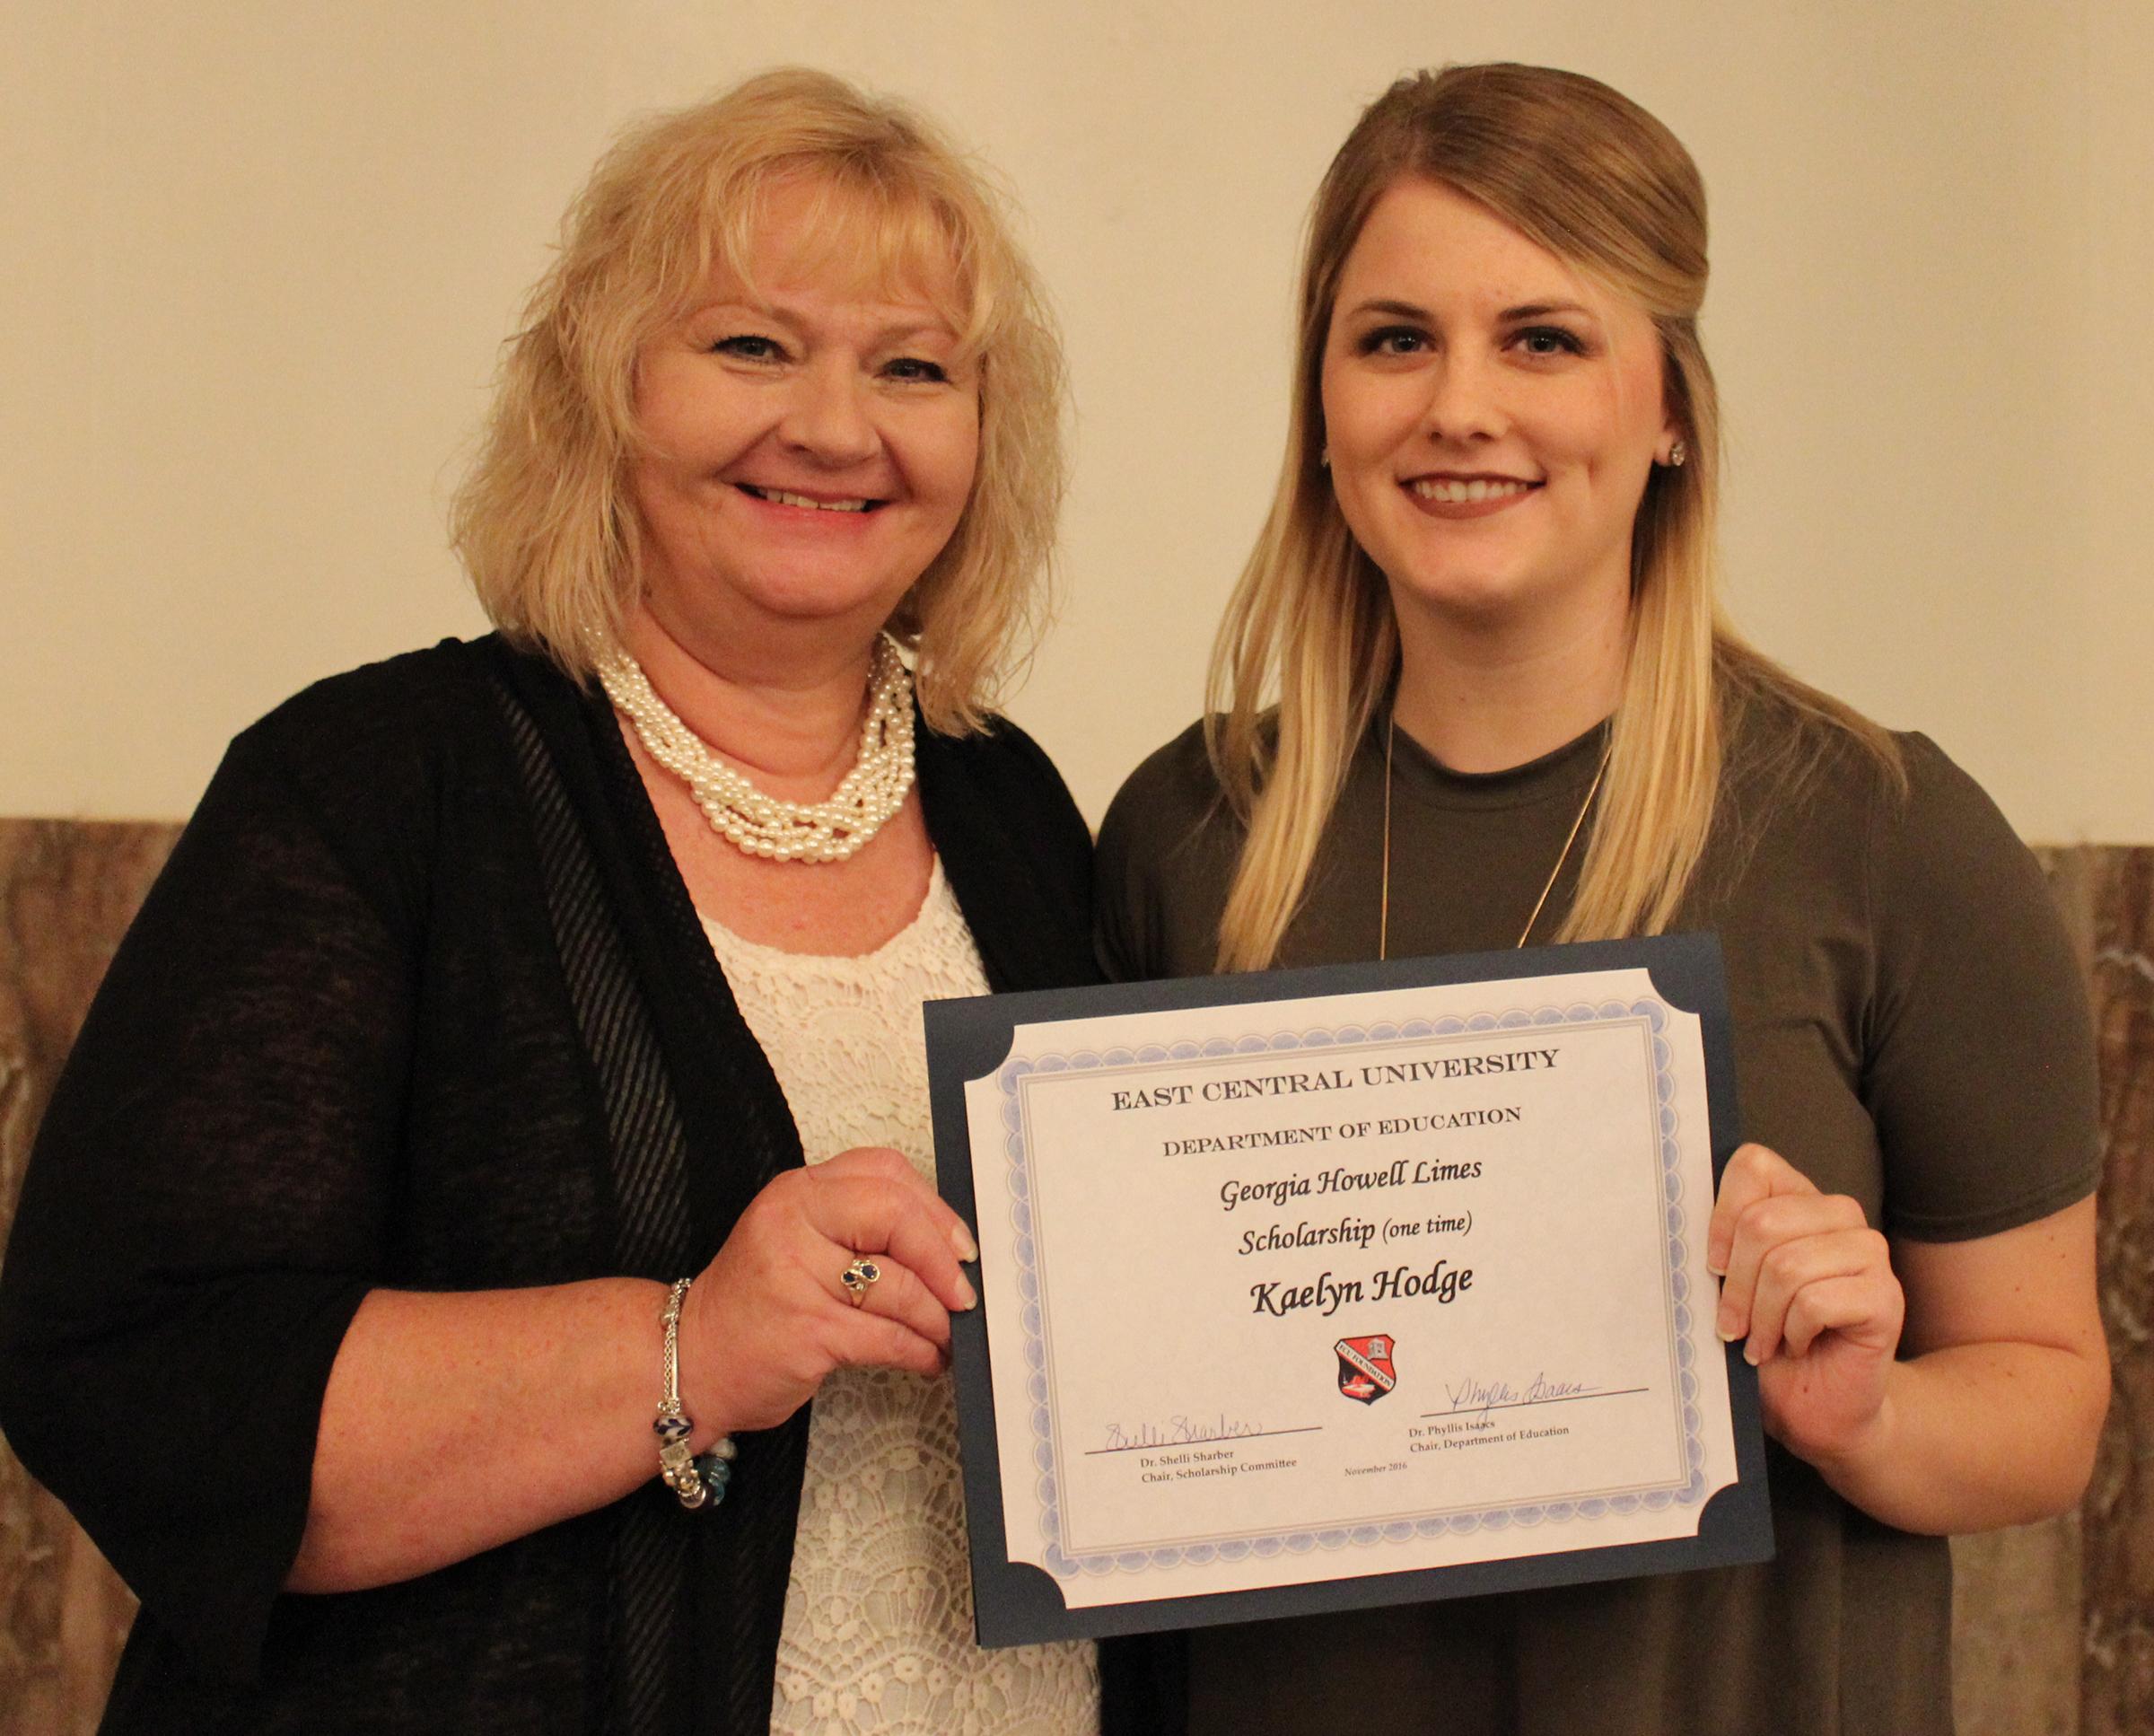 Kaelyn hodge 2 scholarships